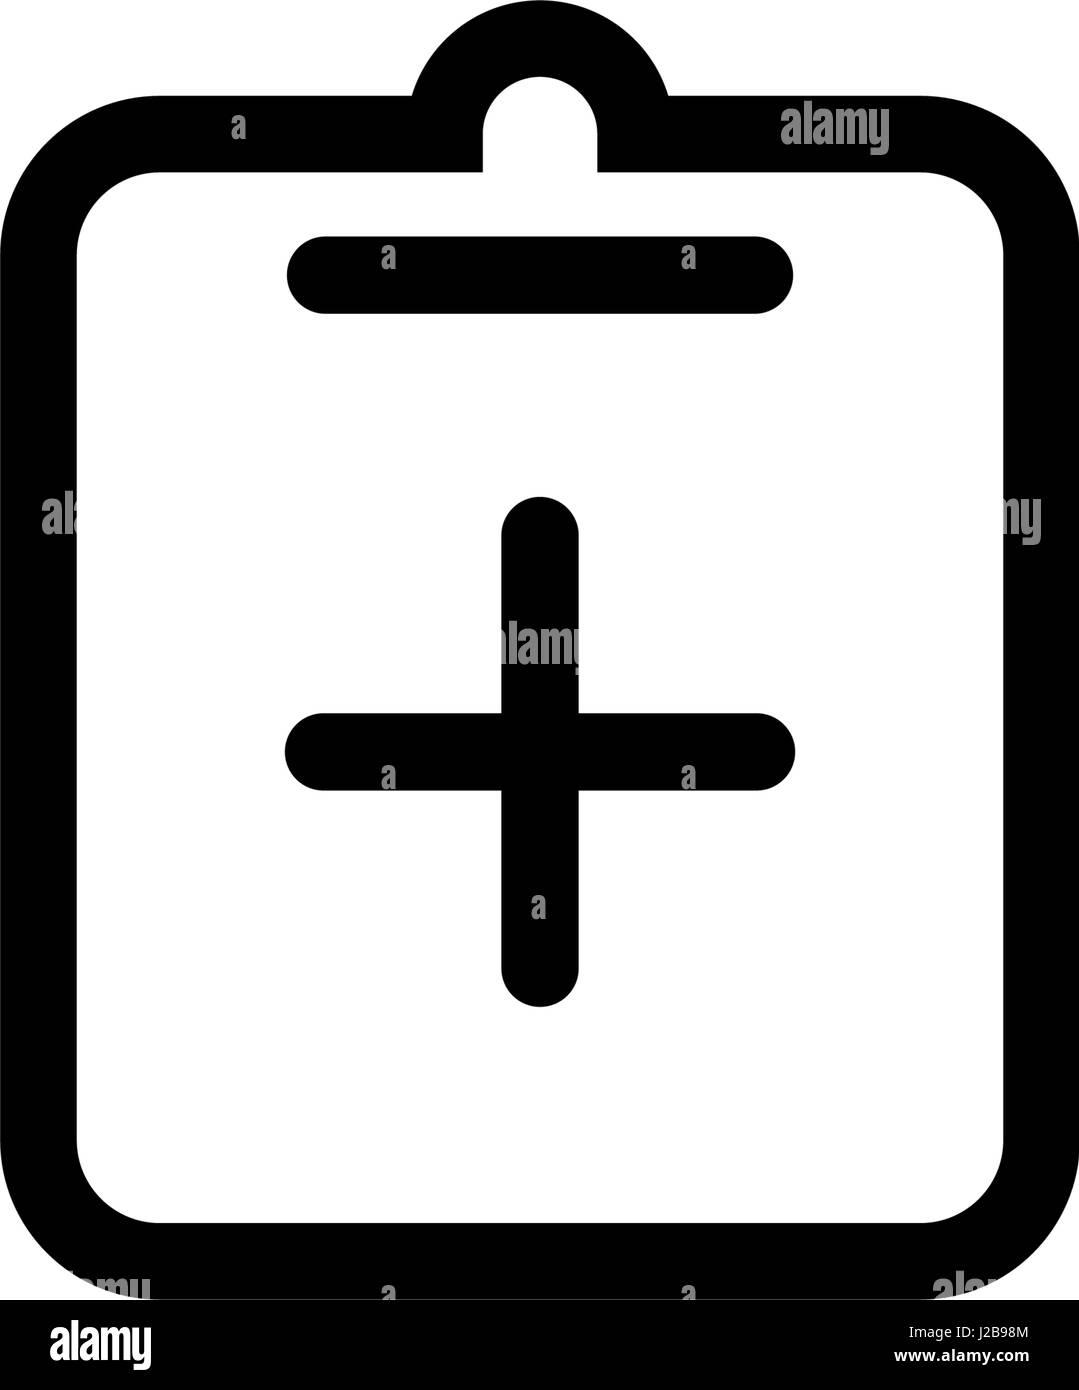 incomplete symbol